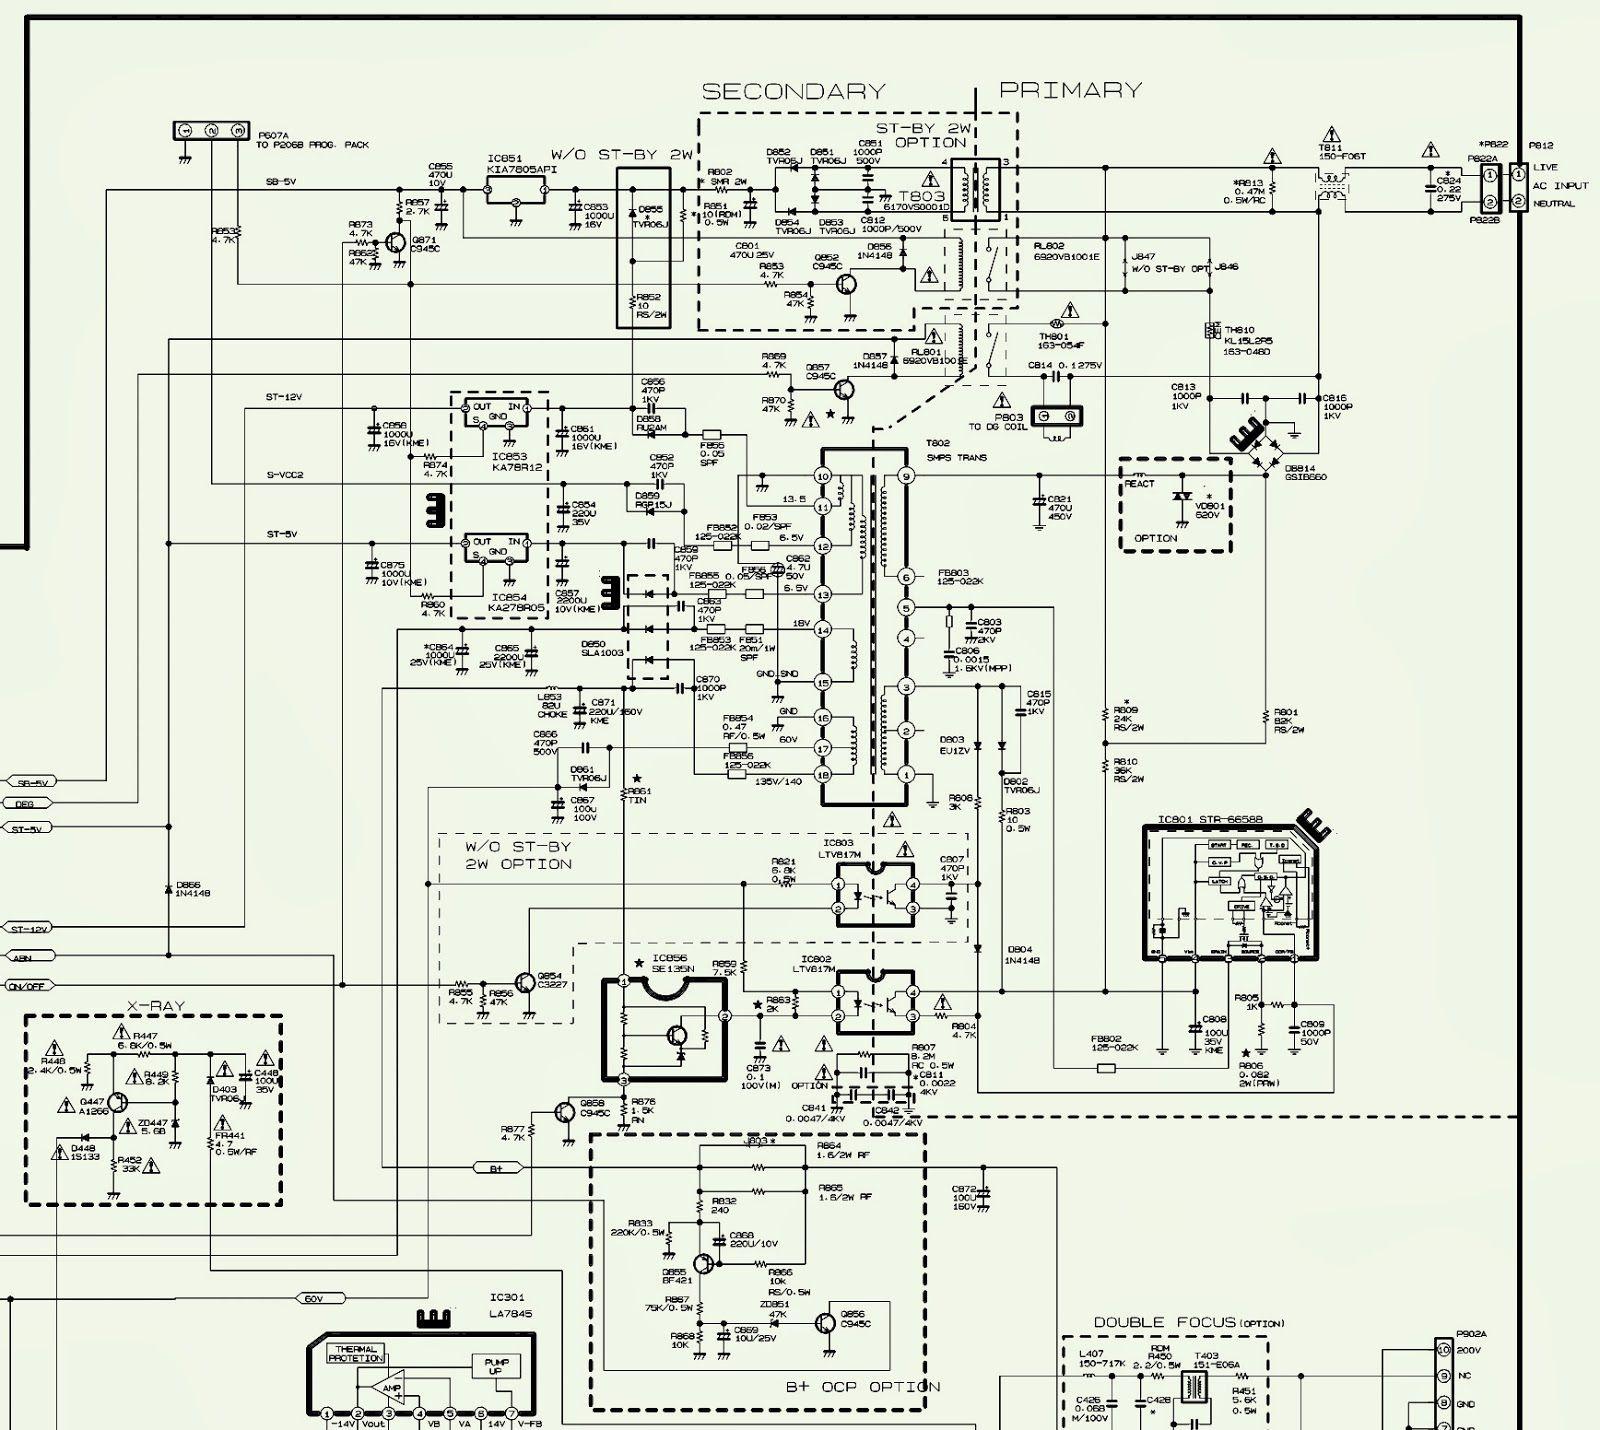 [DIAGRAM_38IS]  RZ_2434] Apple Cinema Display Wiring Diagram Free Download Wiring Diagrams  Schematic Wiring | T V Circuit Diagram Free Download |  | Ivoro Kapemie Mohammedshrine Librar Wiring 101